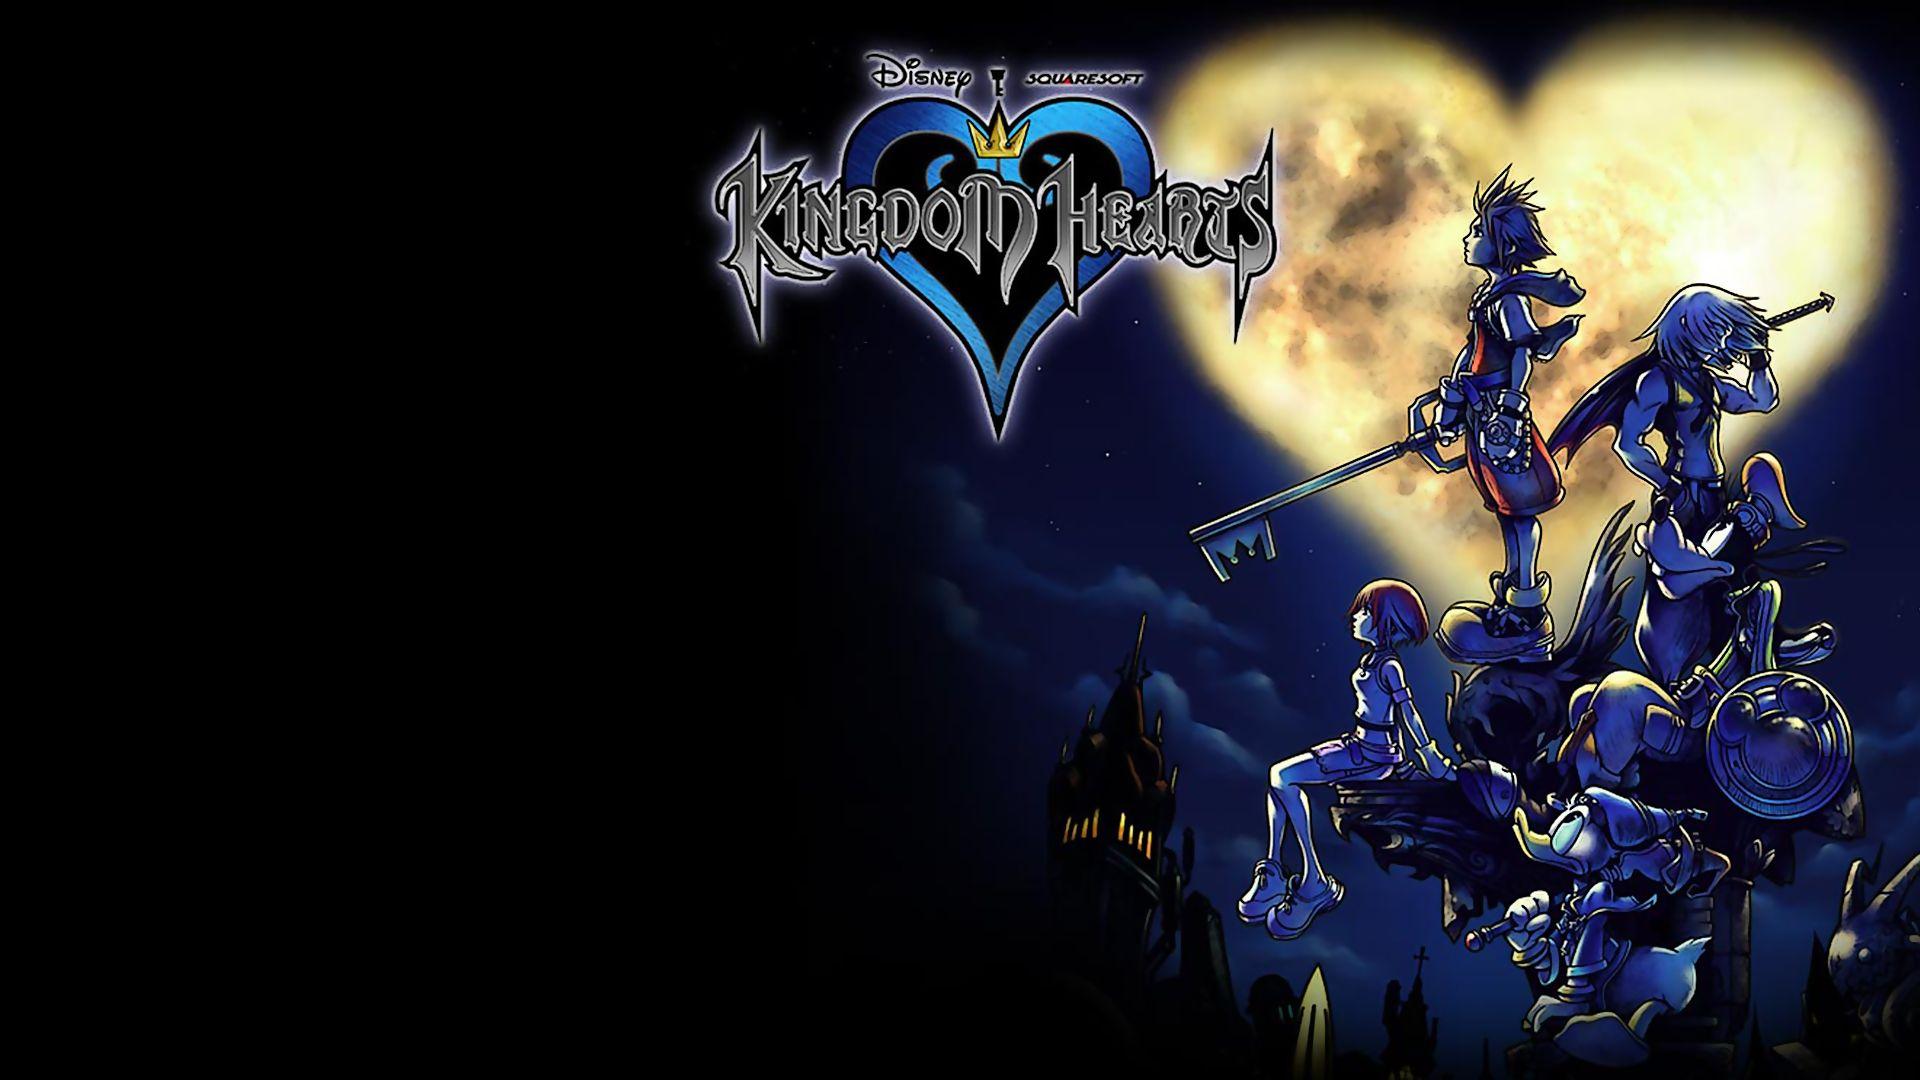 Free Kingdom Hearts Wallpaper Hd Resolution Kingdom Hearts